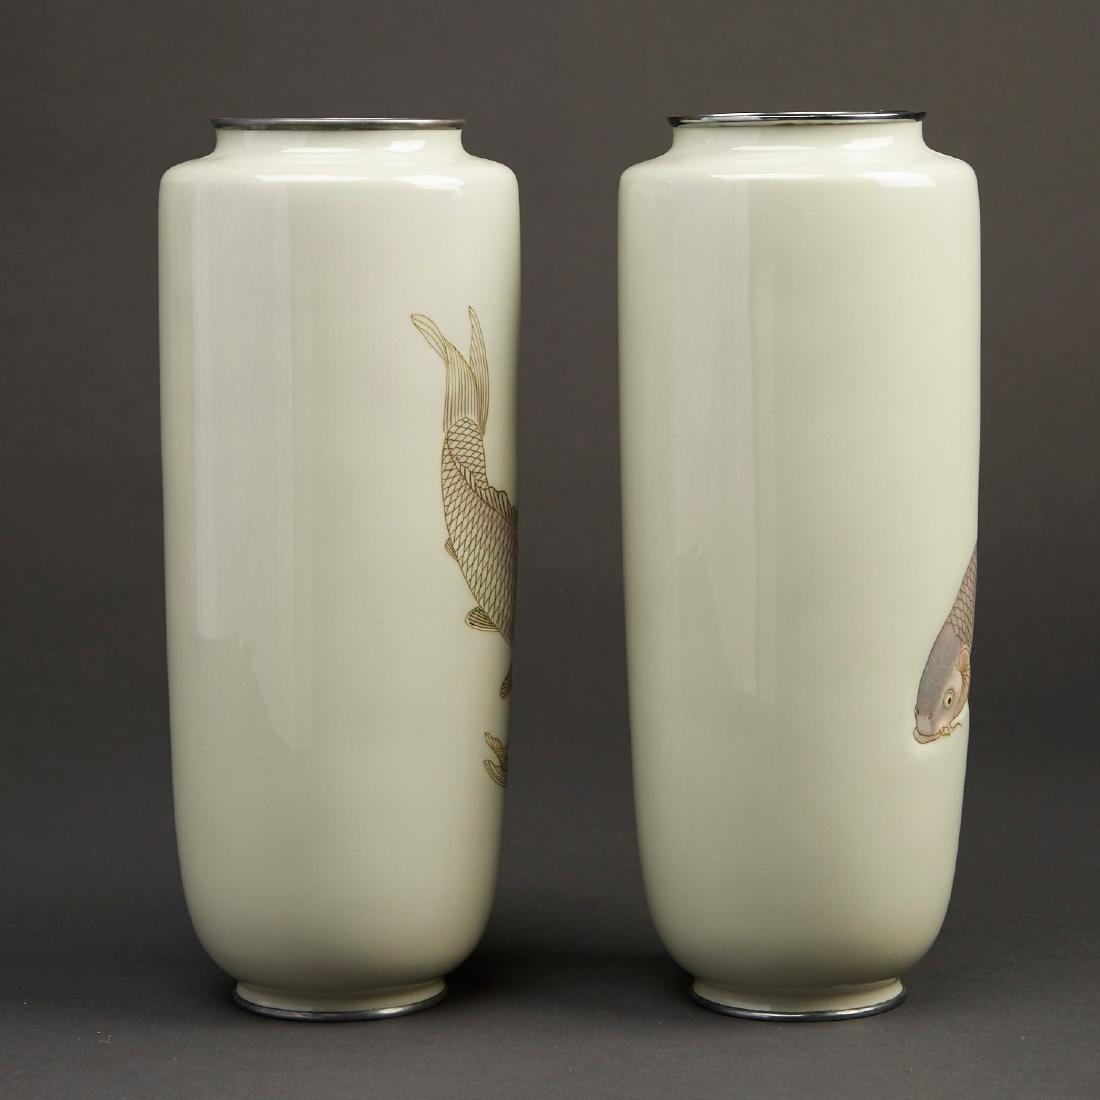 Hattori Tadasaburo Japanese Cloisonne Carp Vases - 2